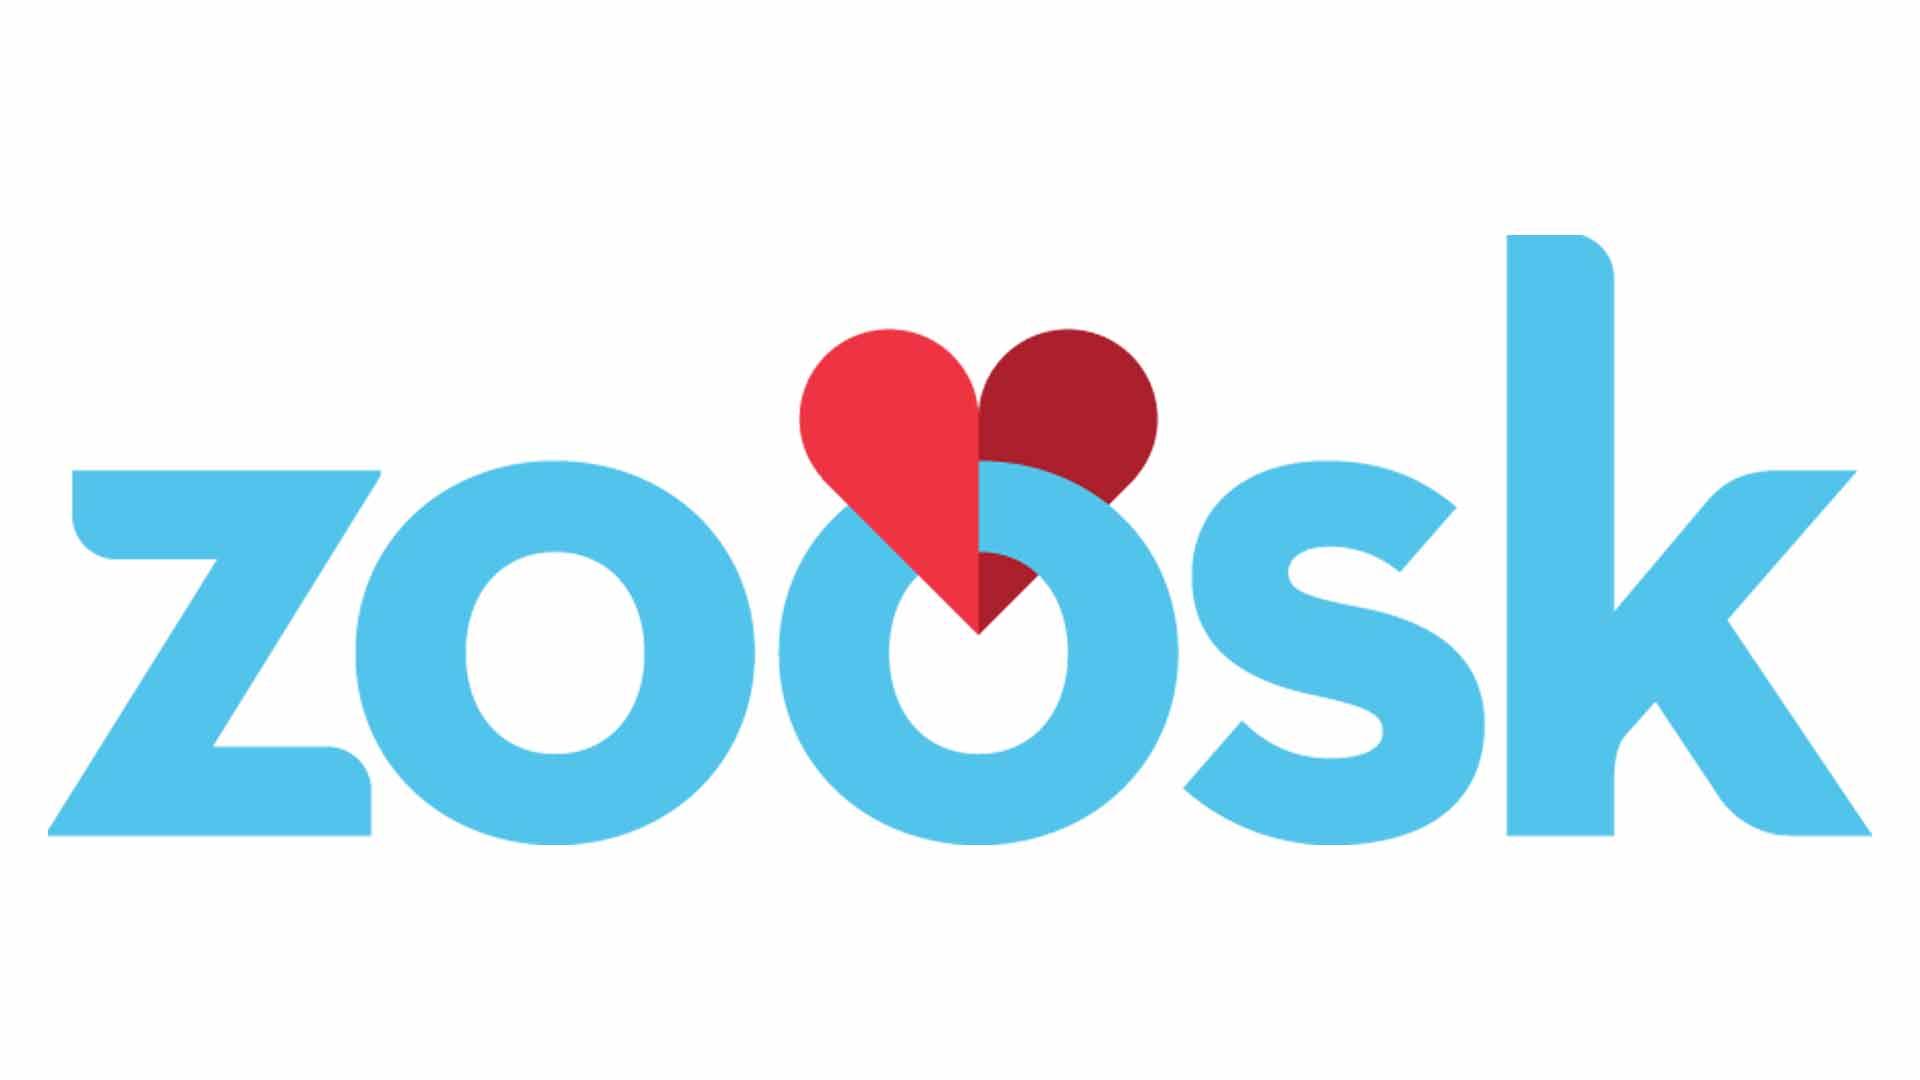 Wie kann ich zoosk Dating-Website kontaktieren